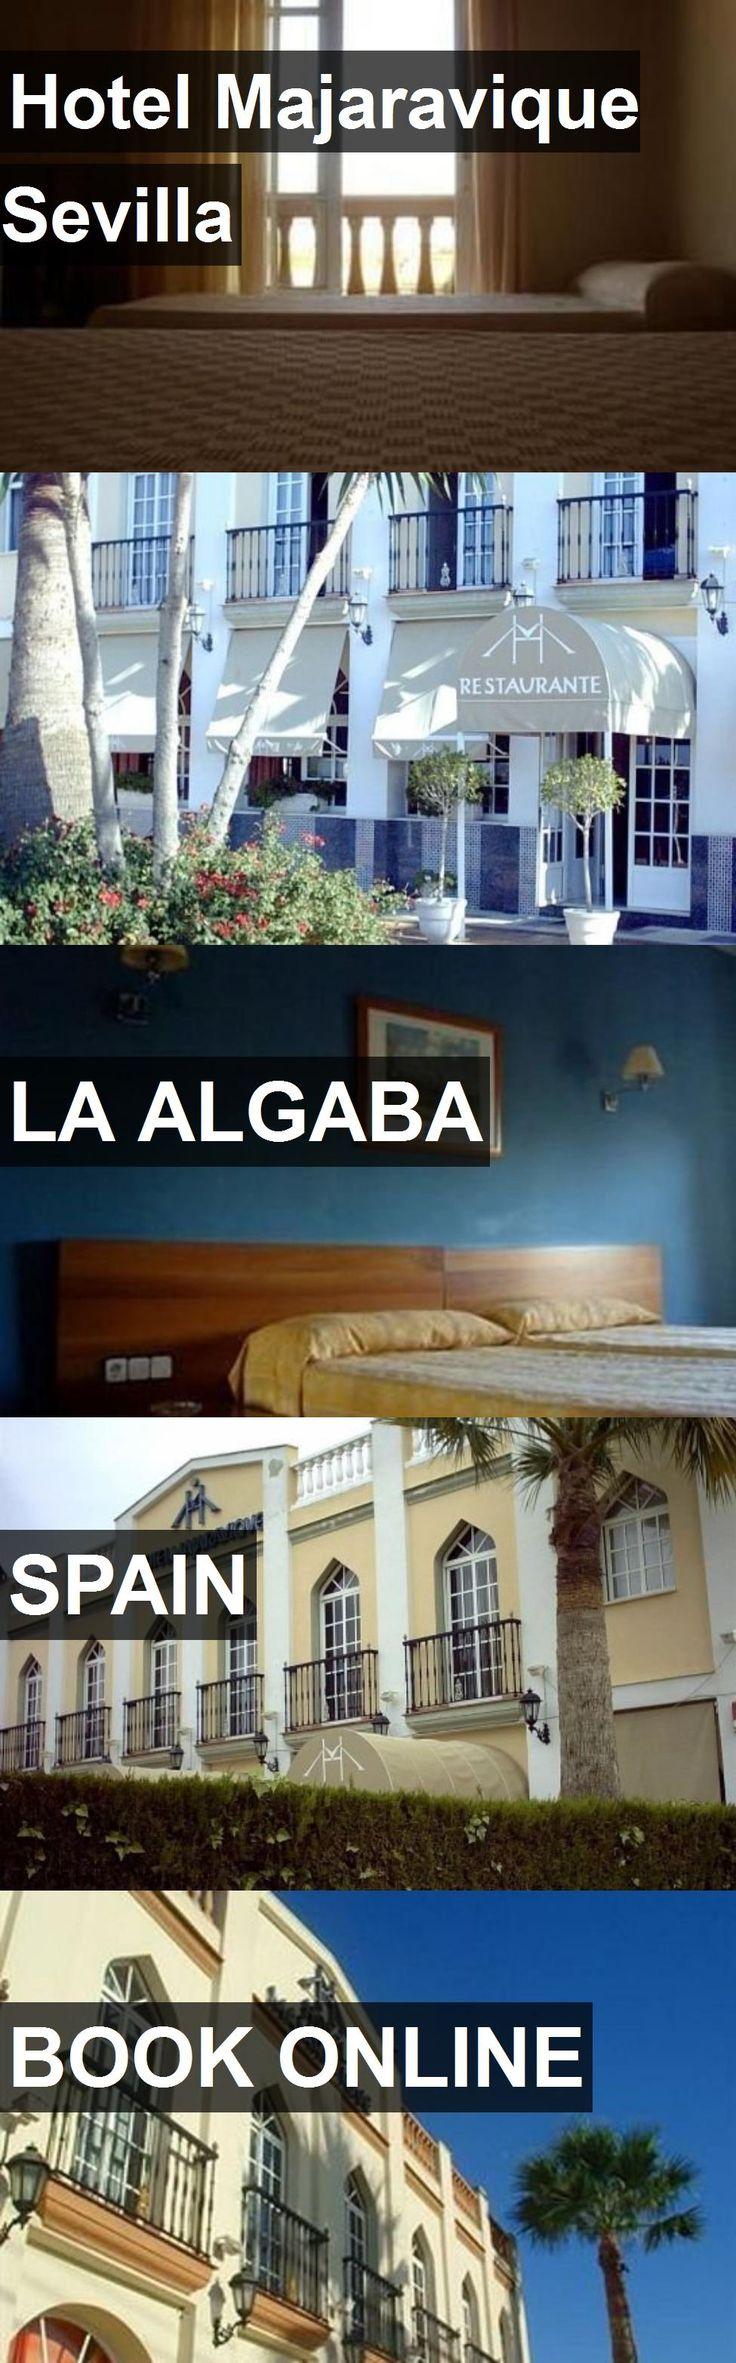 Hotel Majaravique Sevilla in La Algaba, Spain. For more information, photos, reviews and best prices please follow the link. #Spain #LaAlgaba #travel #vacation #hotel